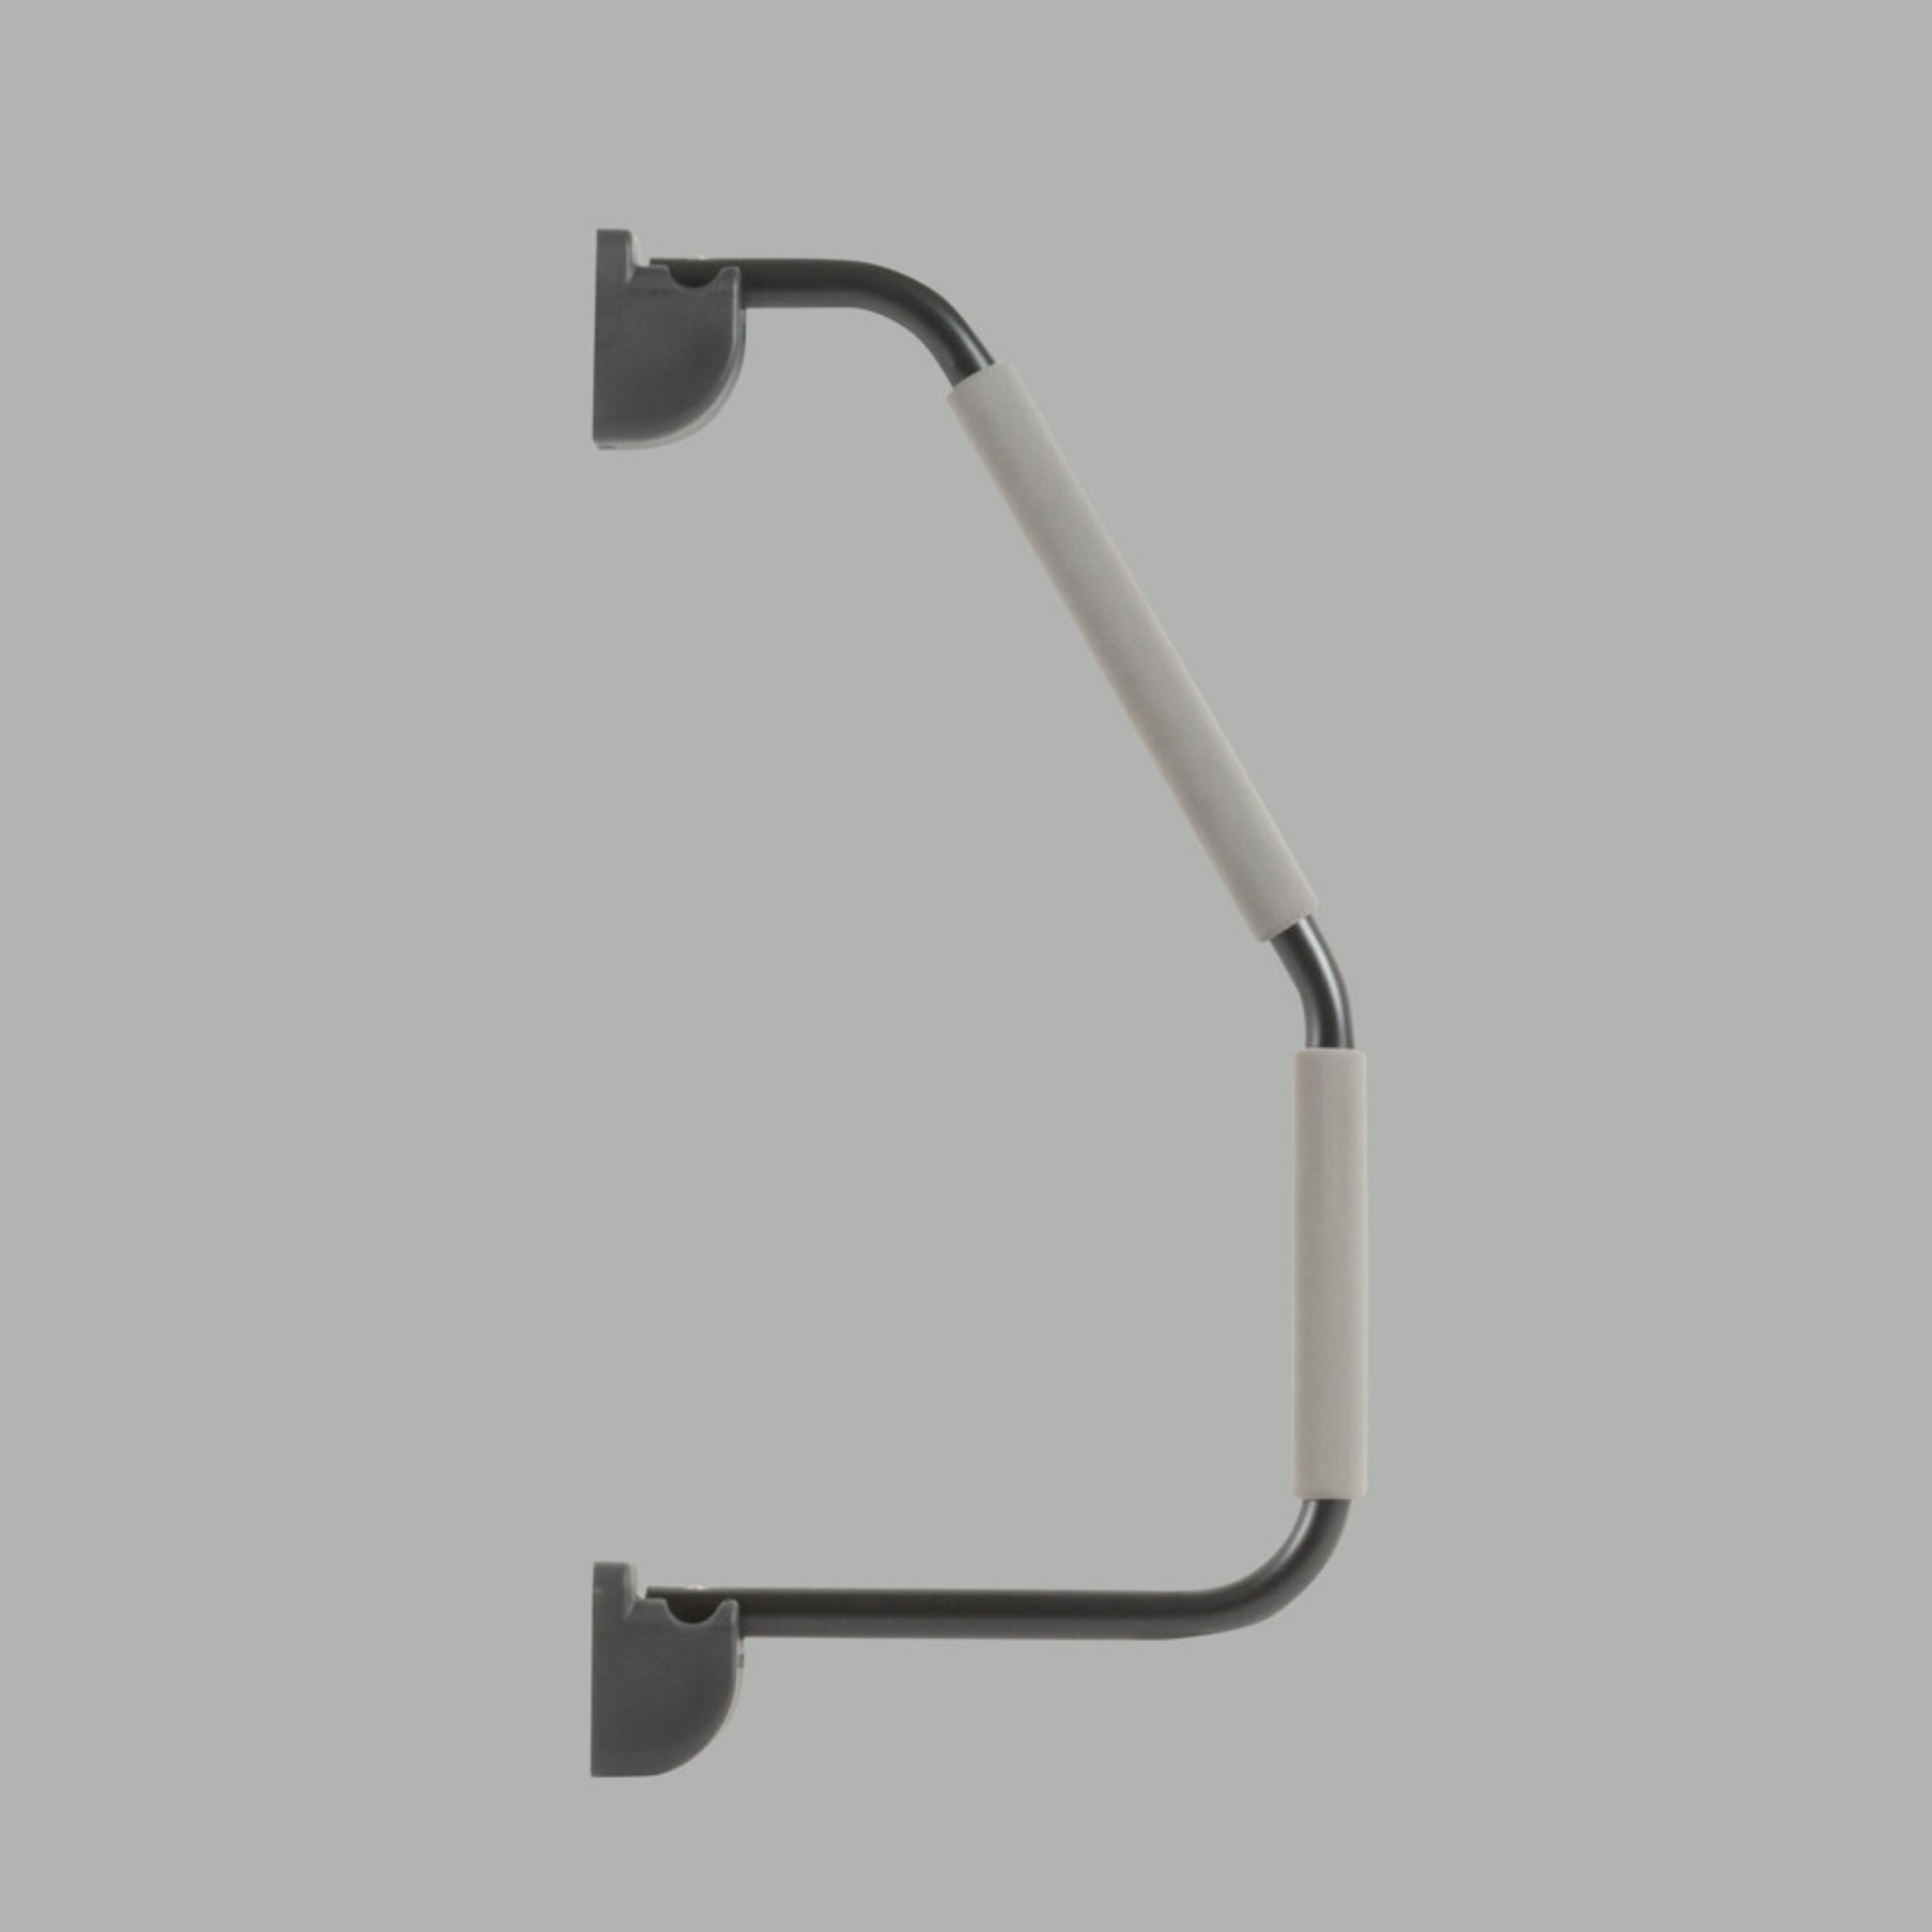 Dometic Milenco Safety Handrail